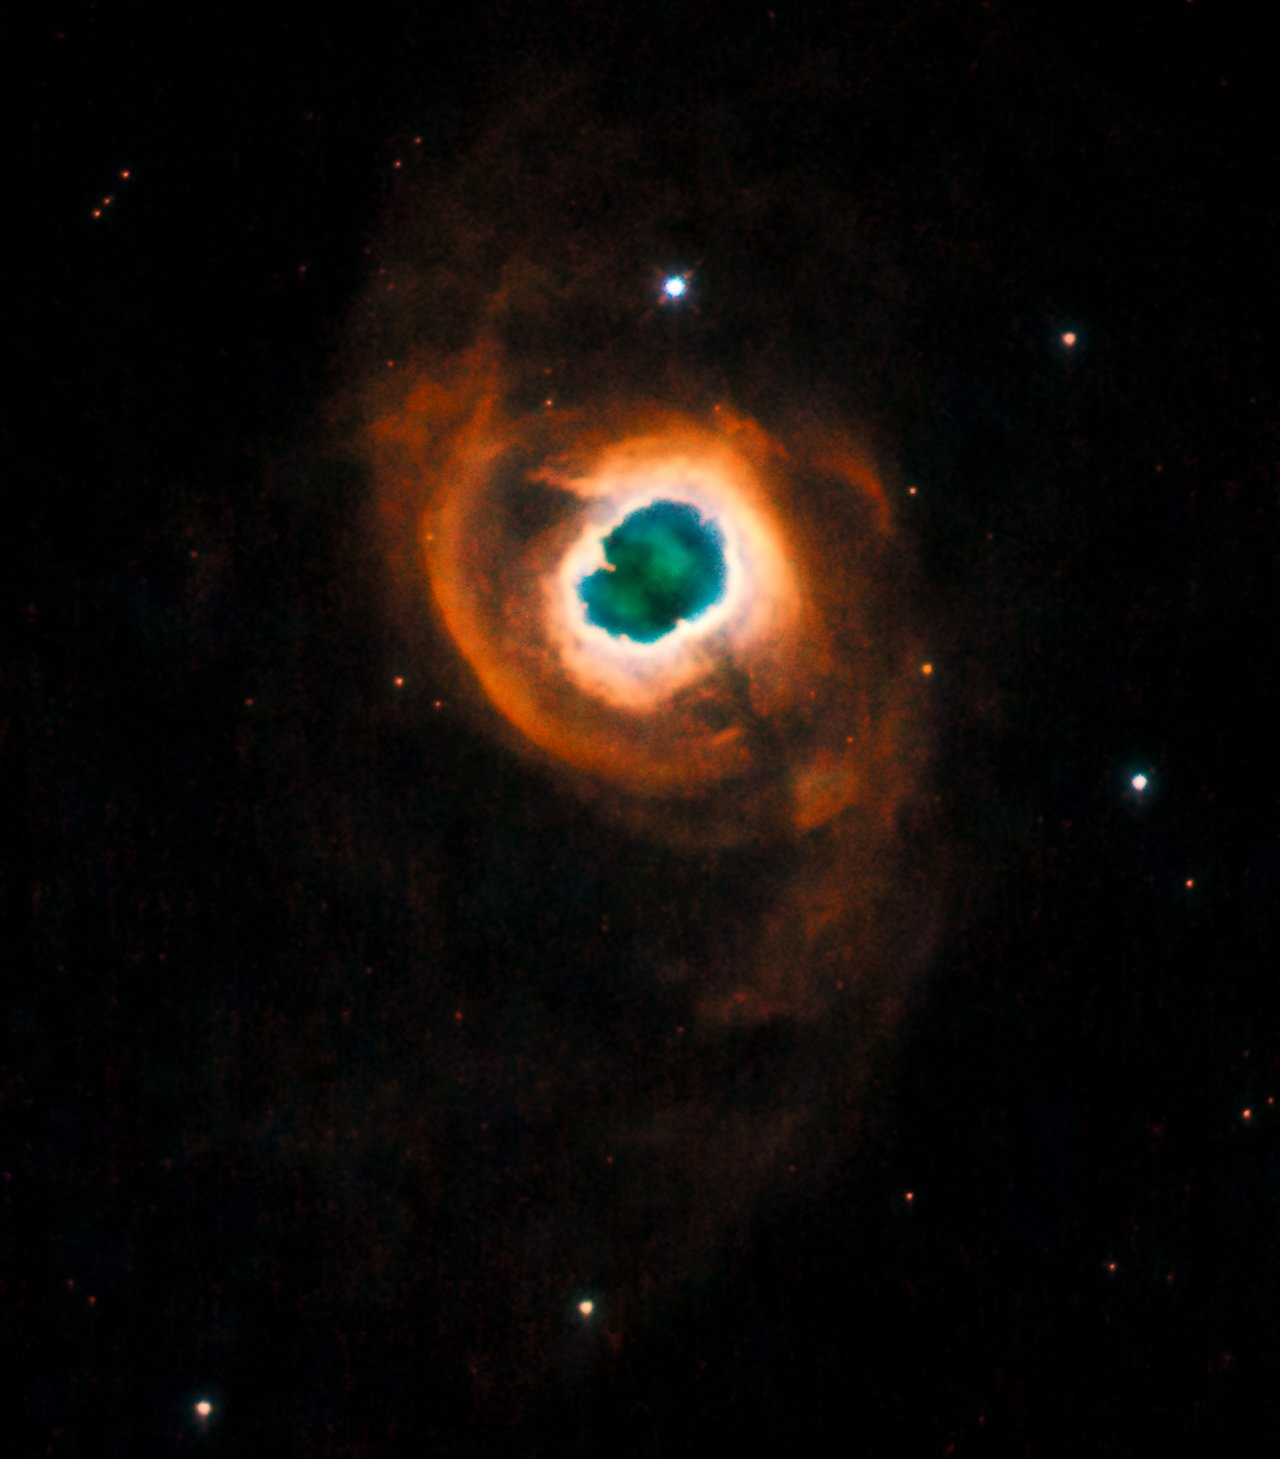 Planetary nebula K 4-55 | ESA/Hubble